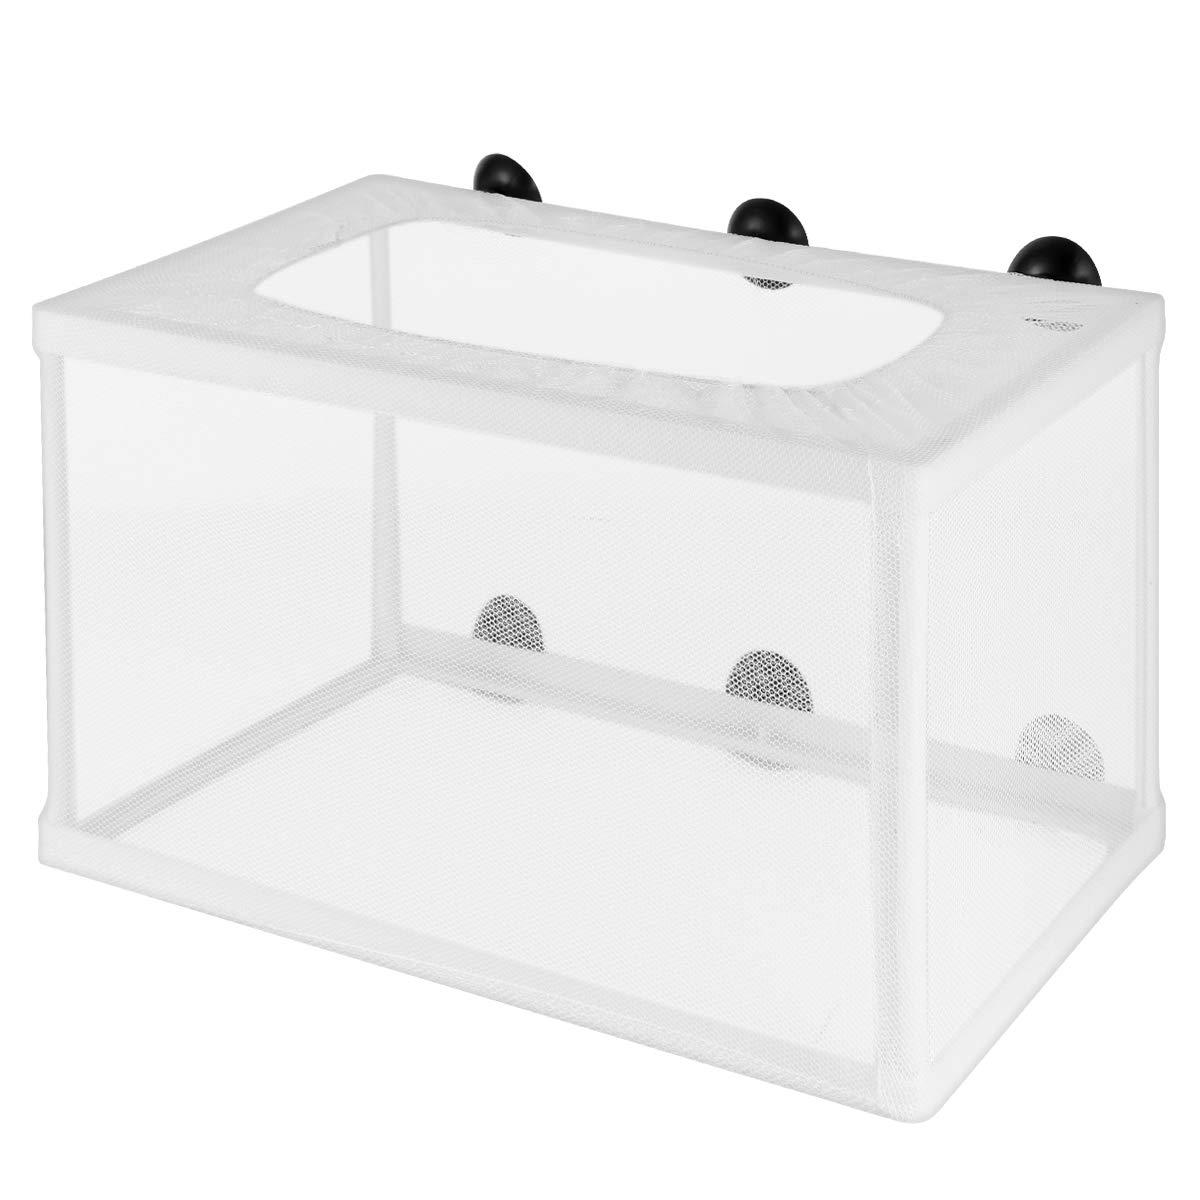 POPETPOP Fish Tank Breeder Net – Big Size Fish Hatchery Breeder Box Separation Net – Fry Hatchery Incubator Mesh with…